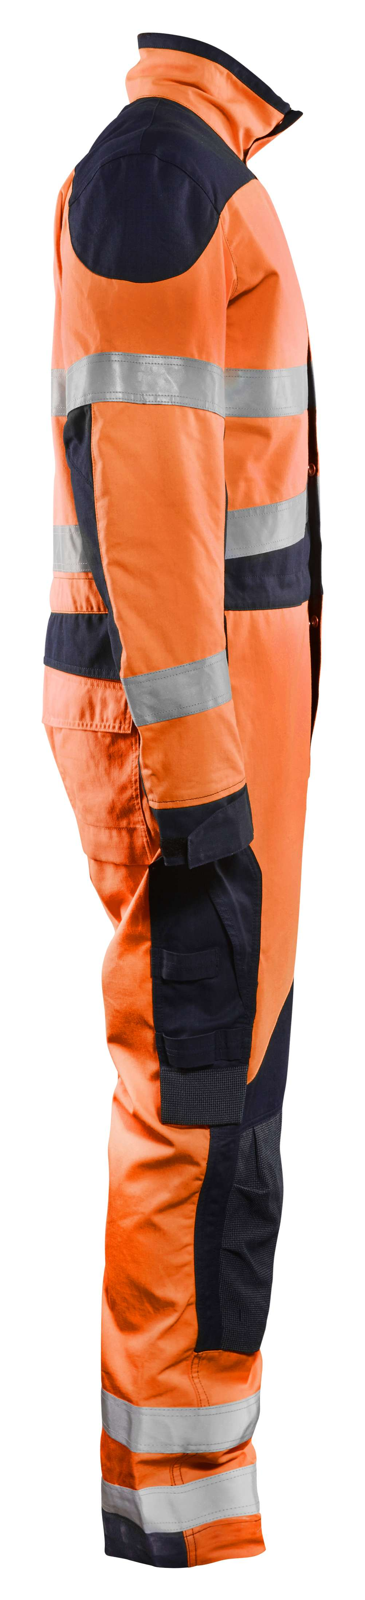 Blaklader Overalls 60891513 Multinorm fluo oranje-marineblauw(5389)